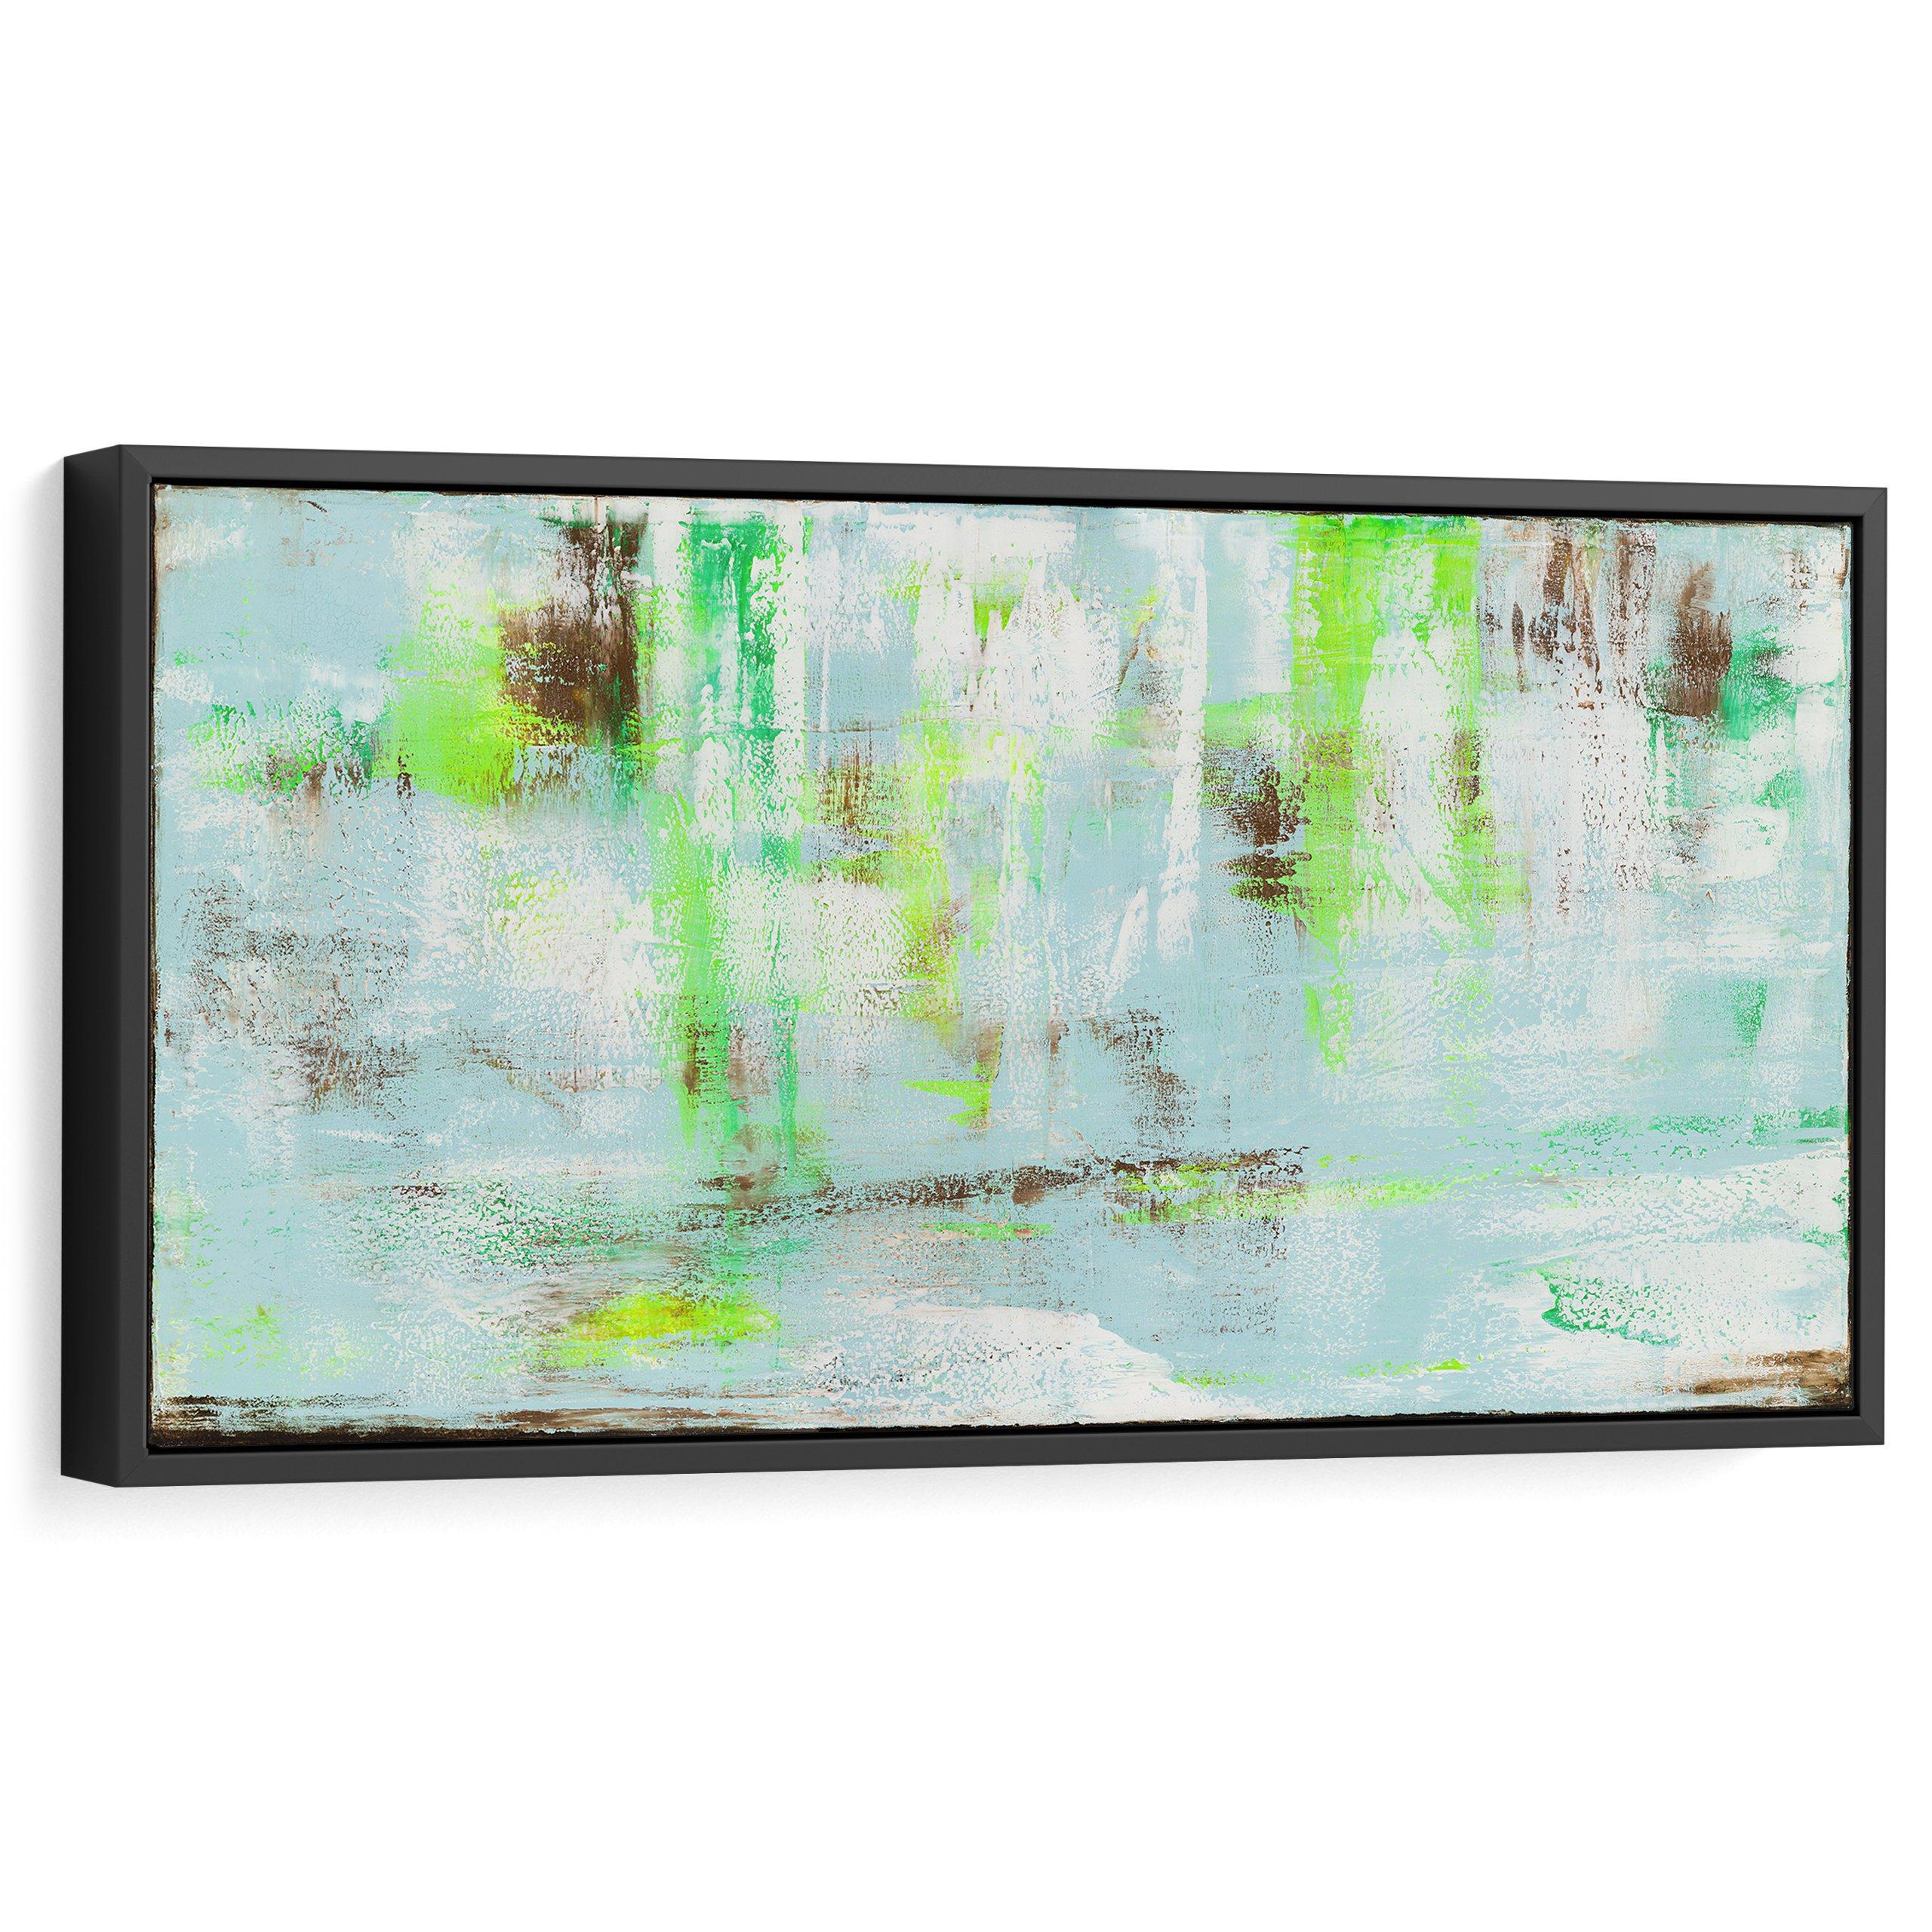 Abstract art in interior design, Modern art in home decor